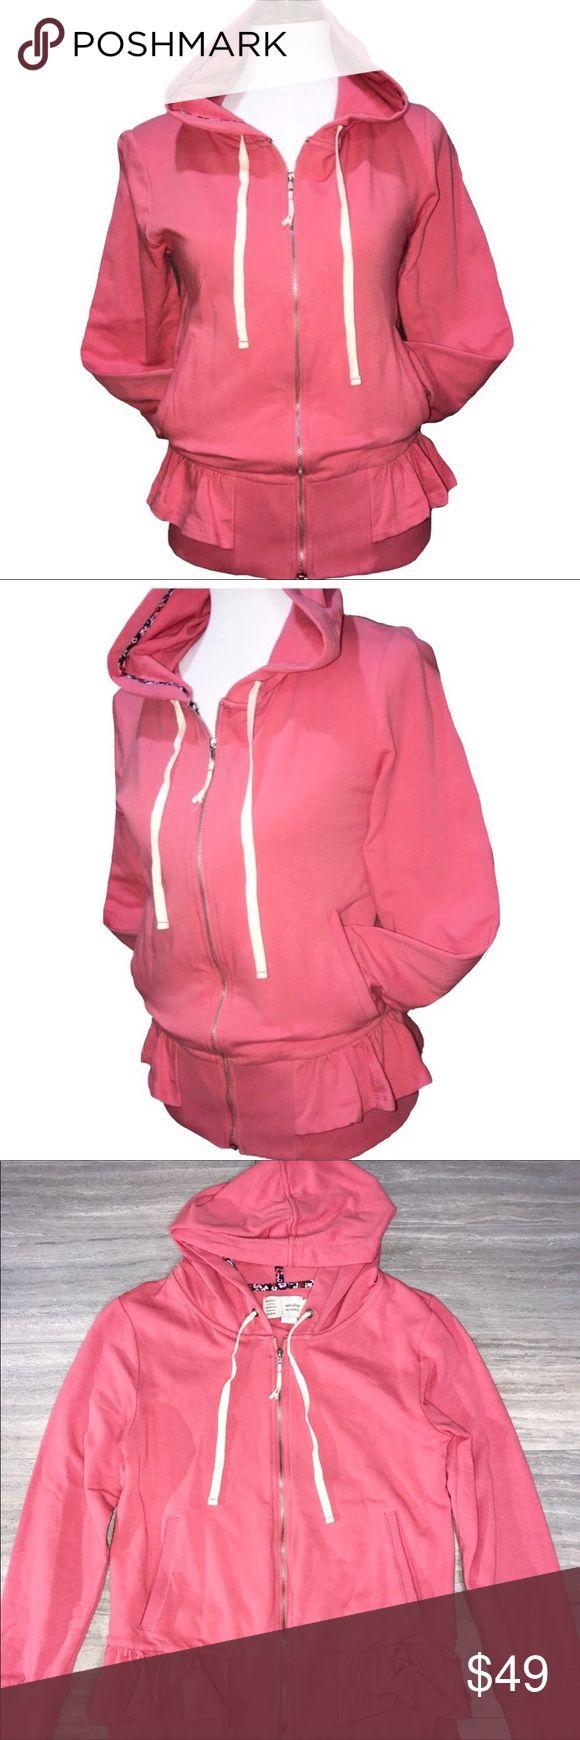 Anthropologie Saturday/Sunday Peplum Zip Up Hoodie Anthropologie Saturday/Sunday salmon pink zip up hoodie. Peplum waist ruffle, hidden large interior pockets on both sides. Great condition! Anthropologie Tops Sweatshirts & Hoodies